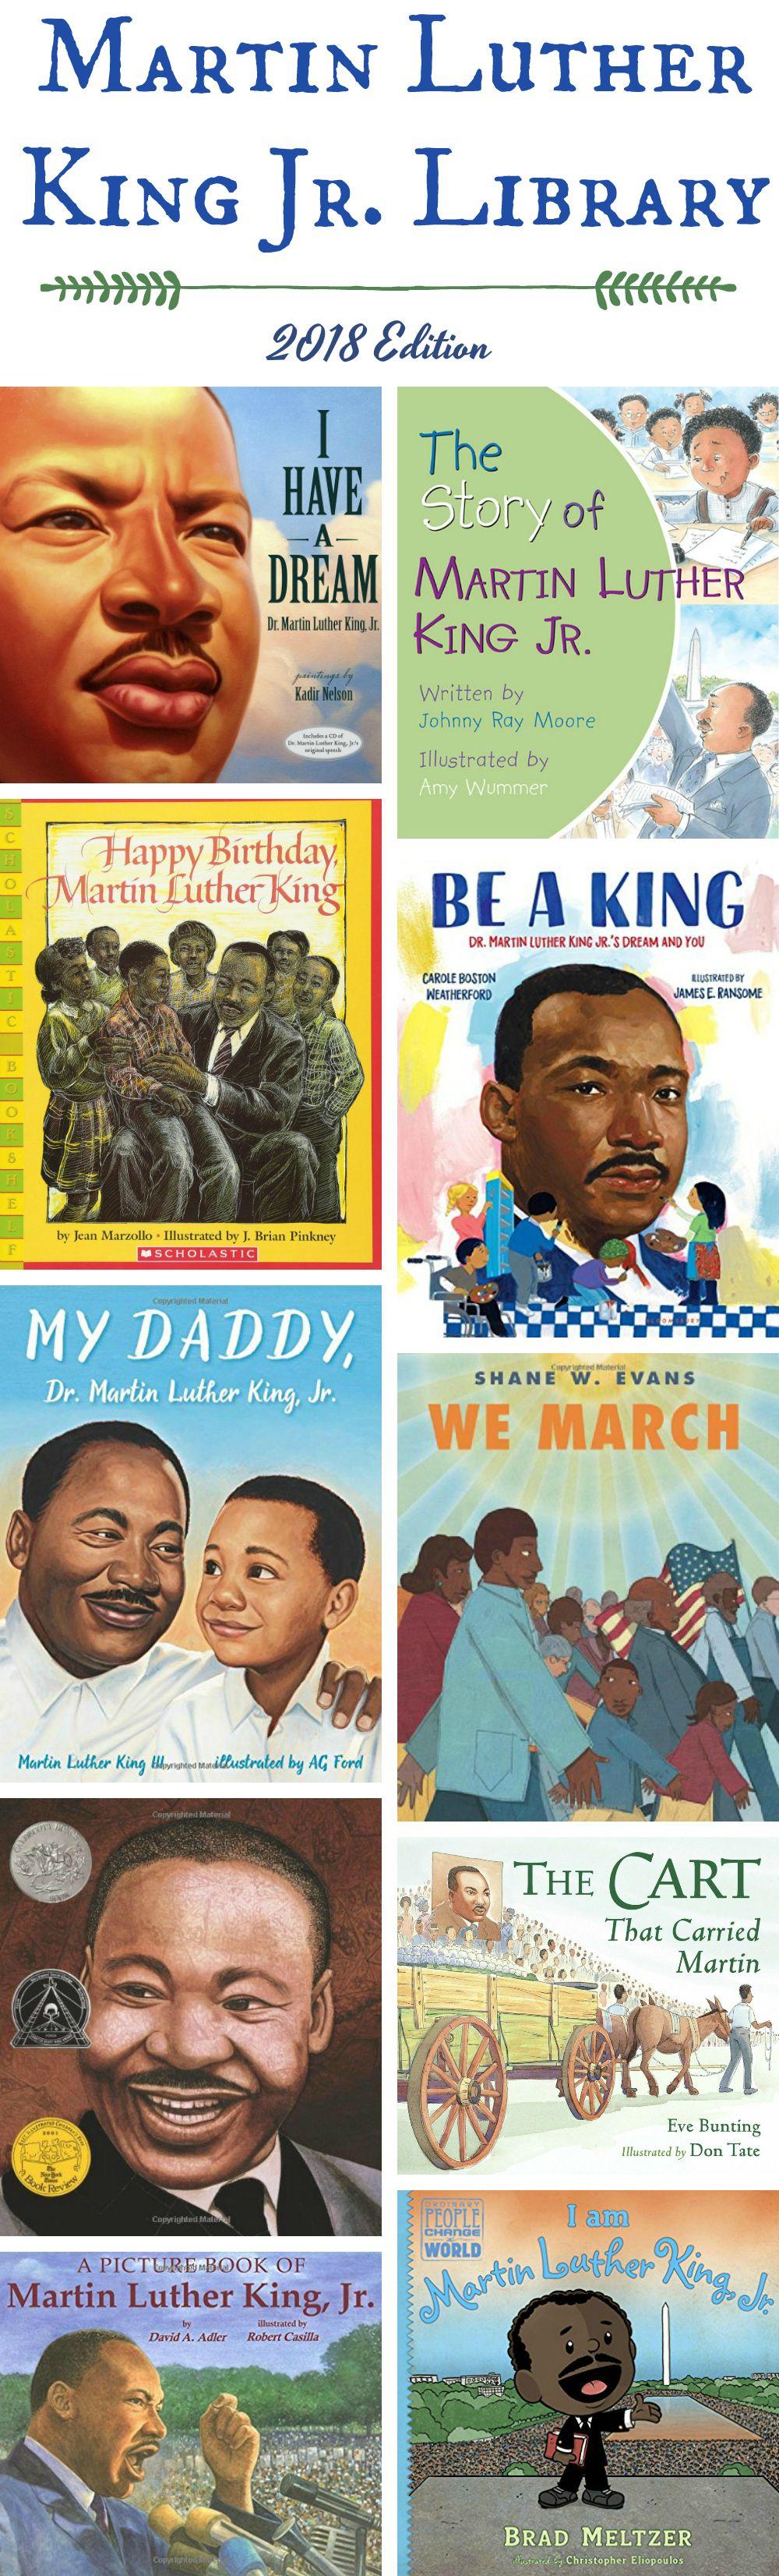 MLK Jr. Day Books for Kids: 2018 Edition | Day book, Mlk ...